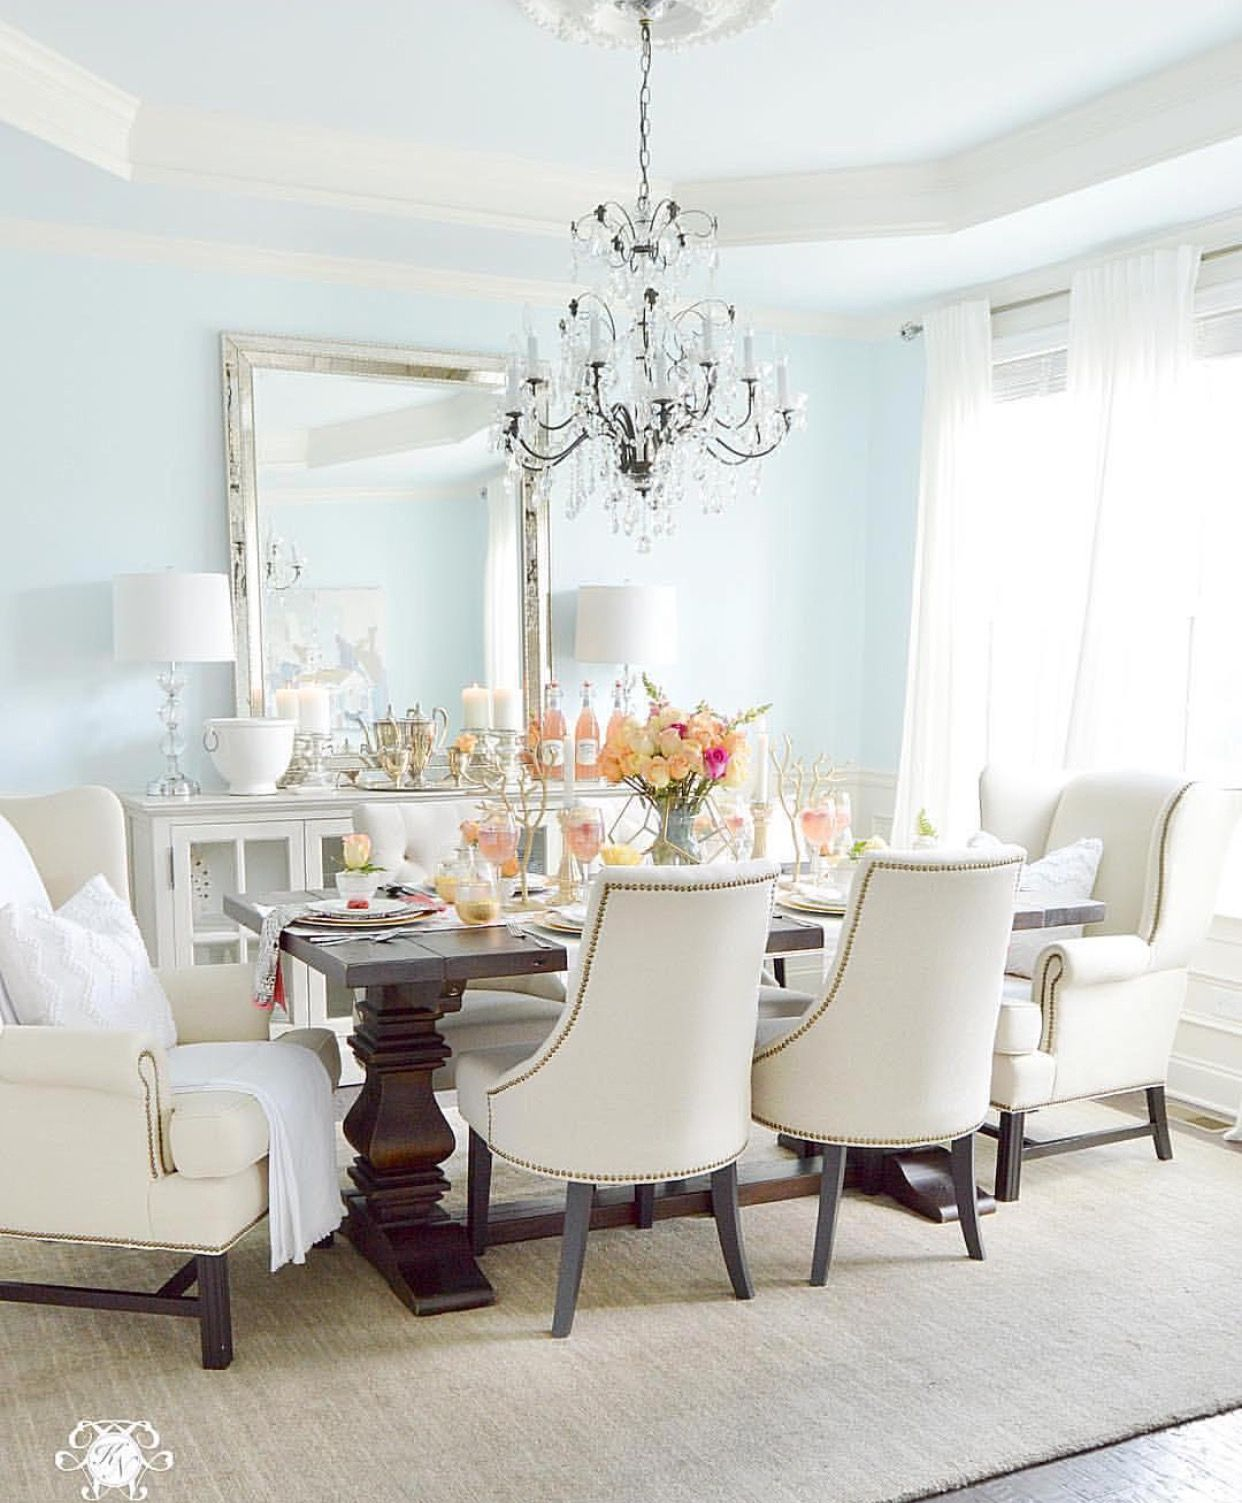 Diy Canned Food Organizer Tutorial Blue Dining Roomselegant